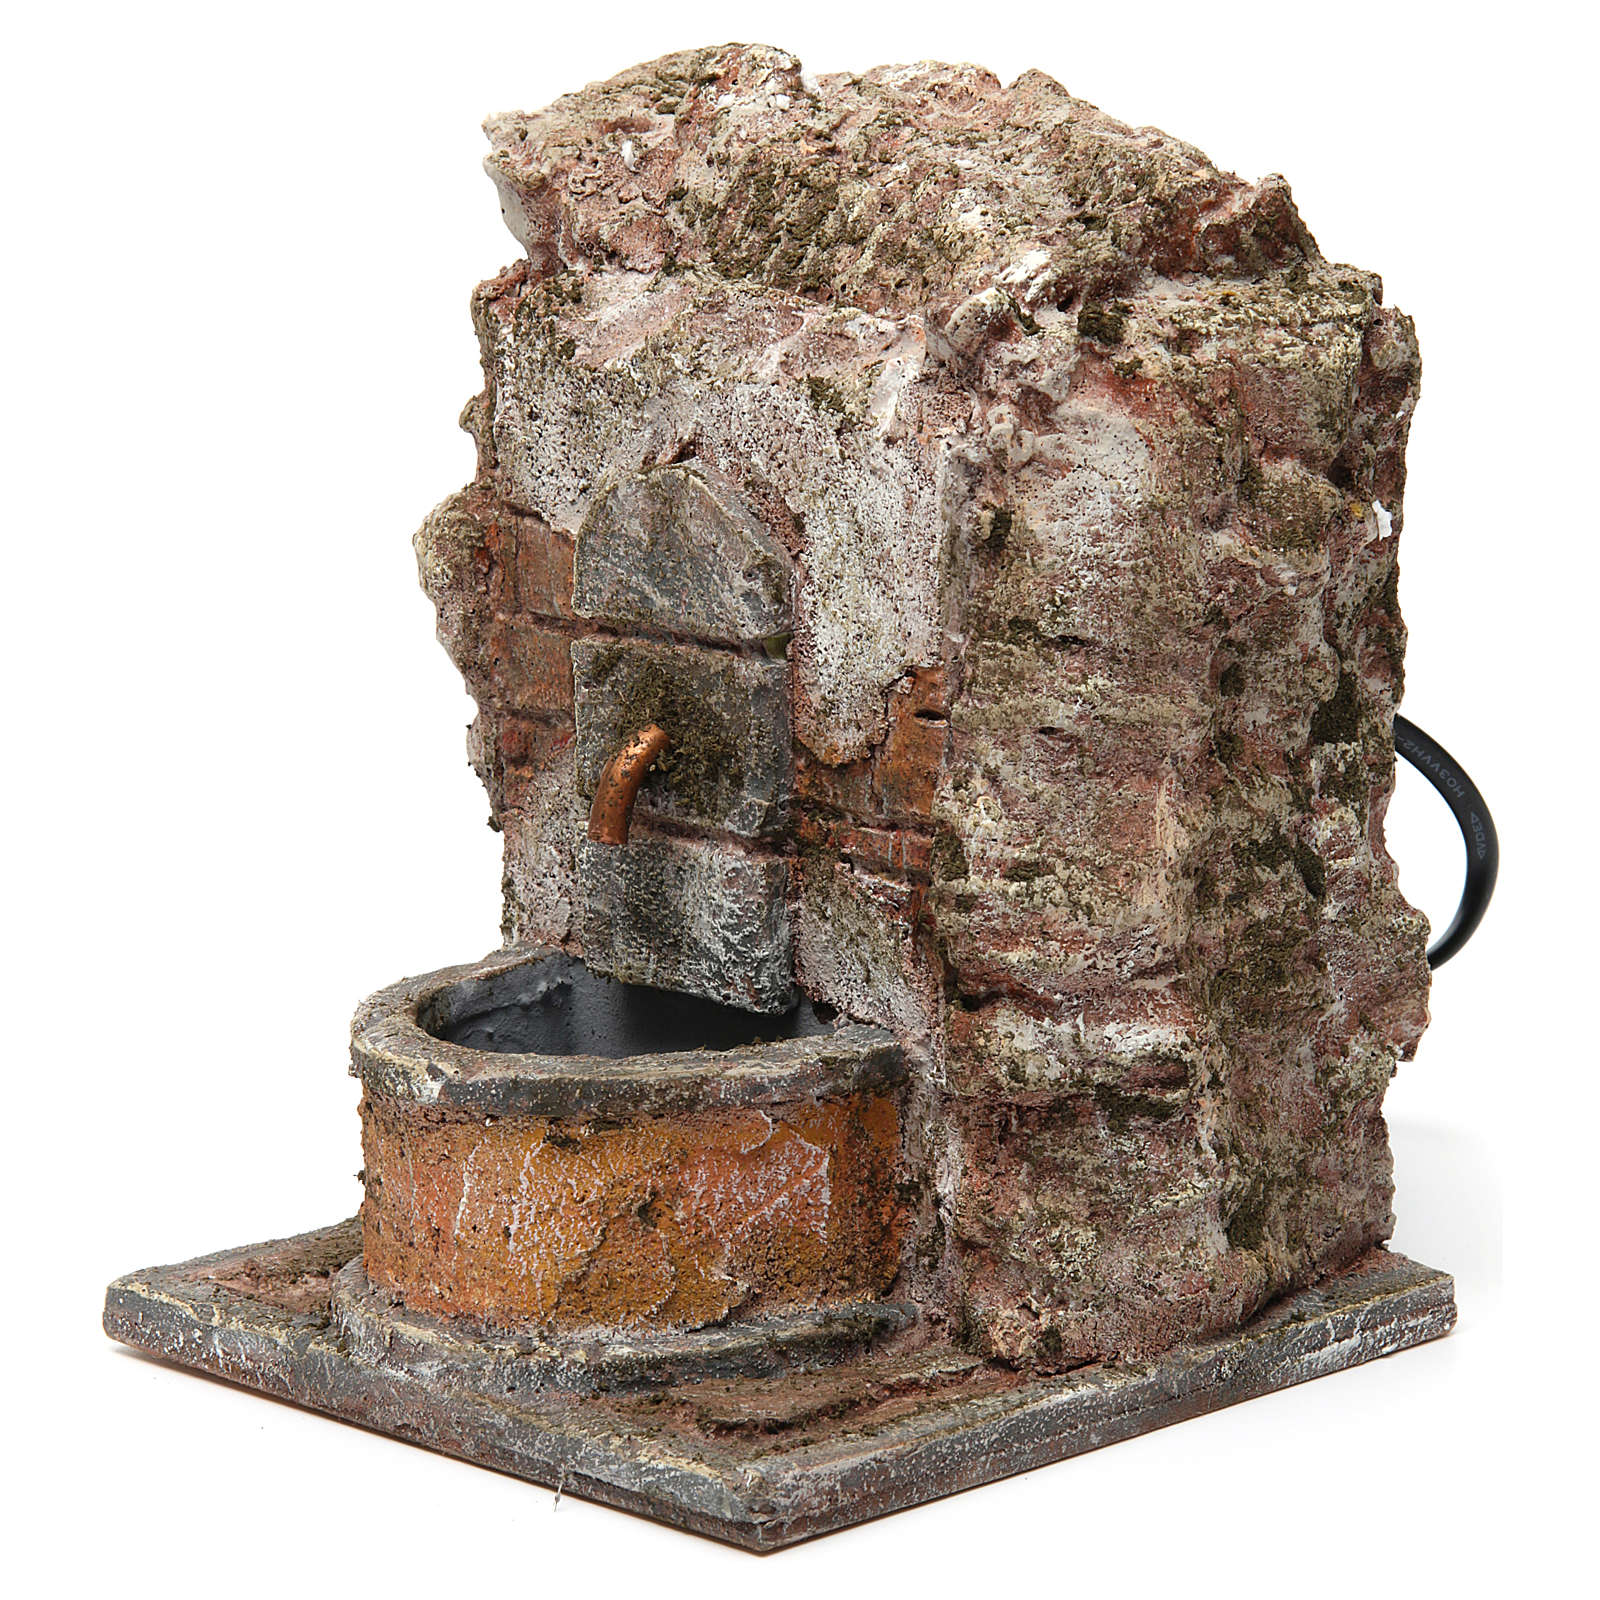 Wall fountain for 10-12 cm nativity scene 4